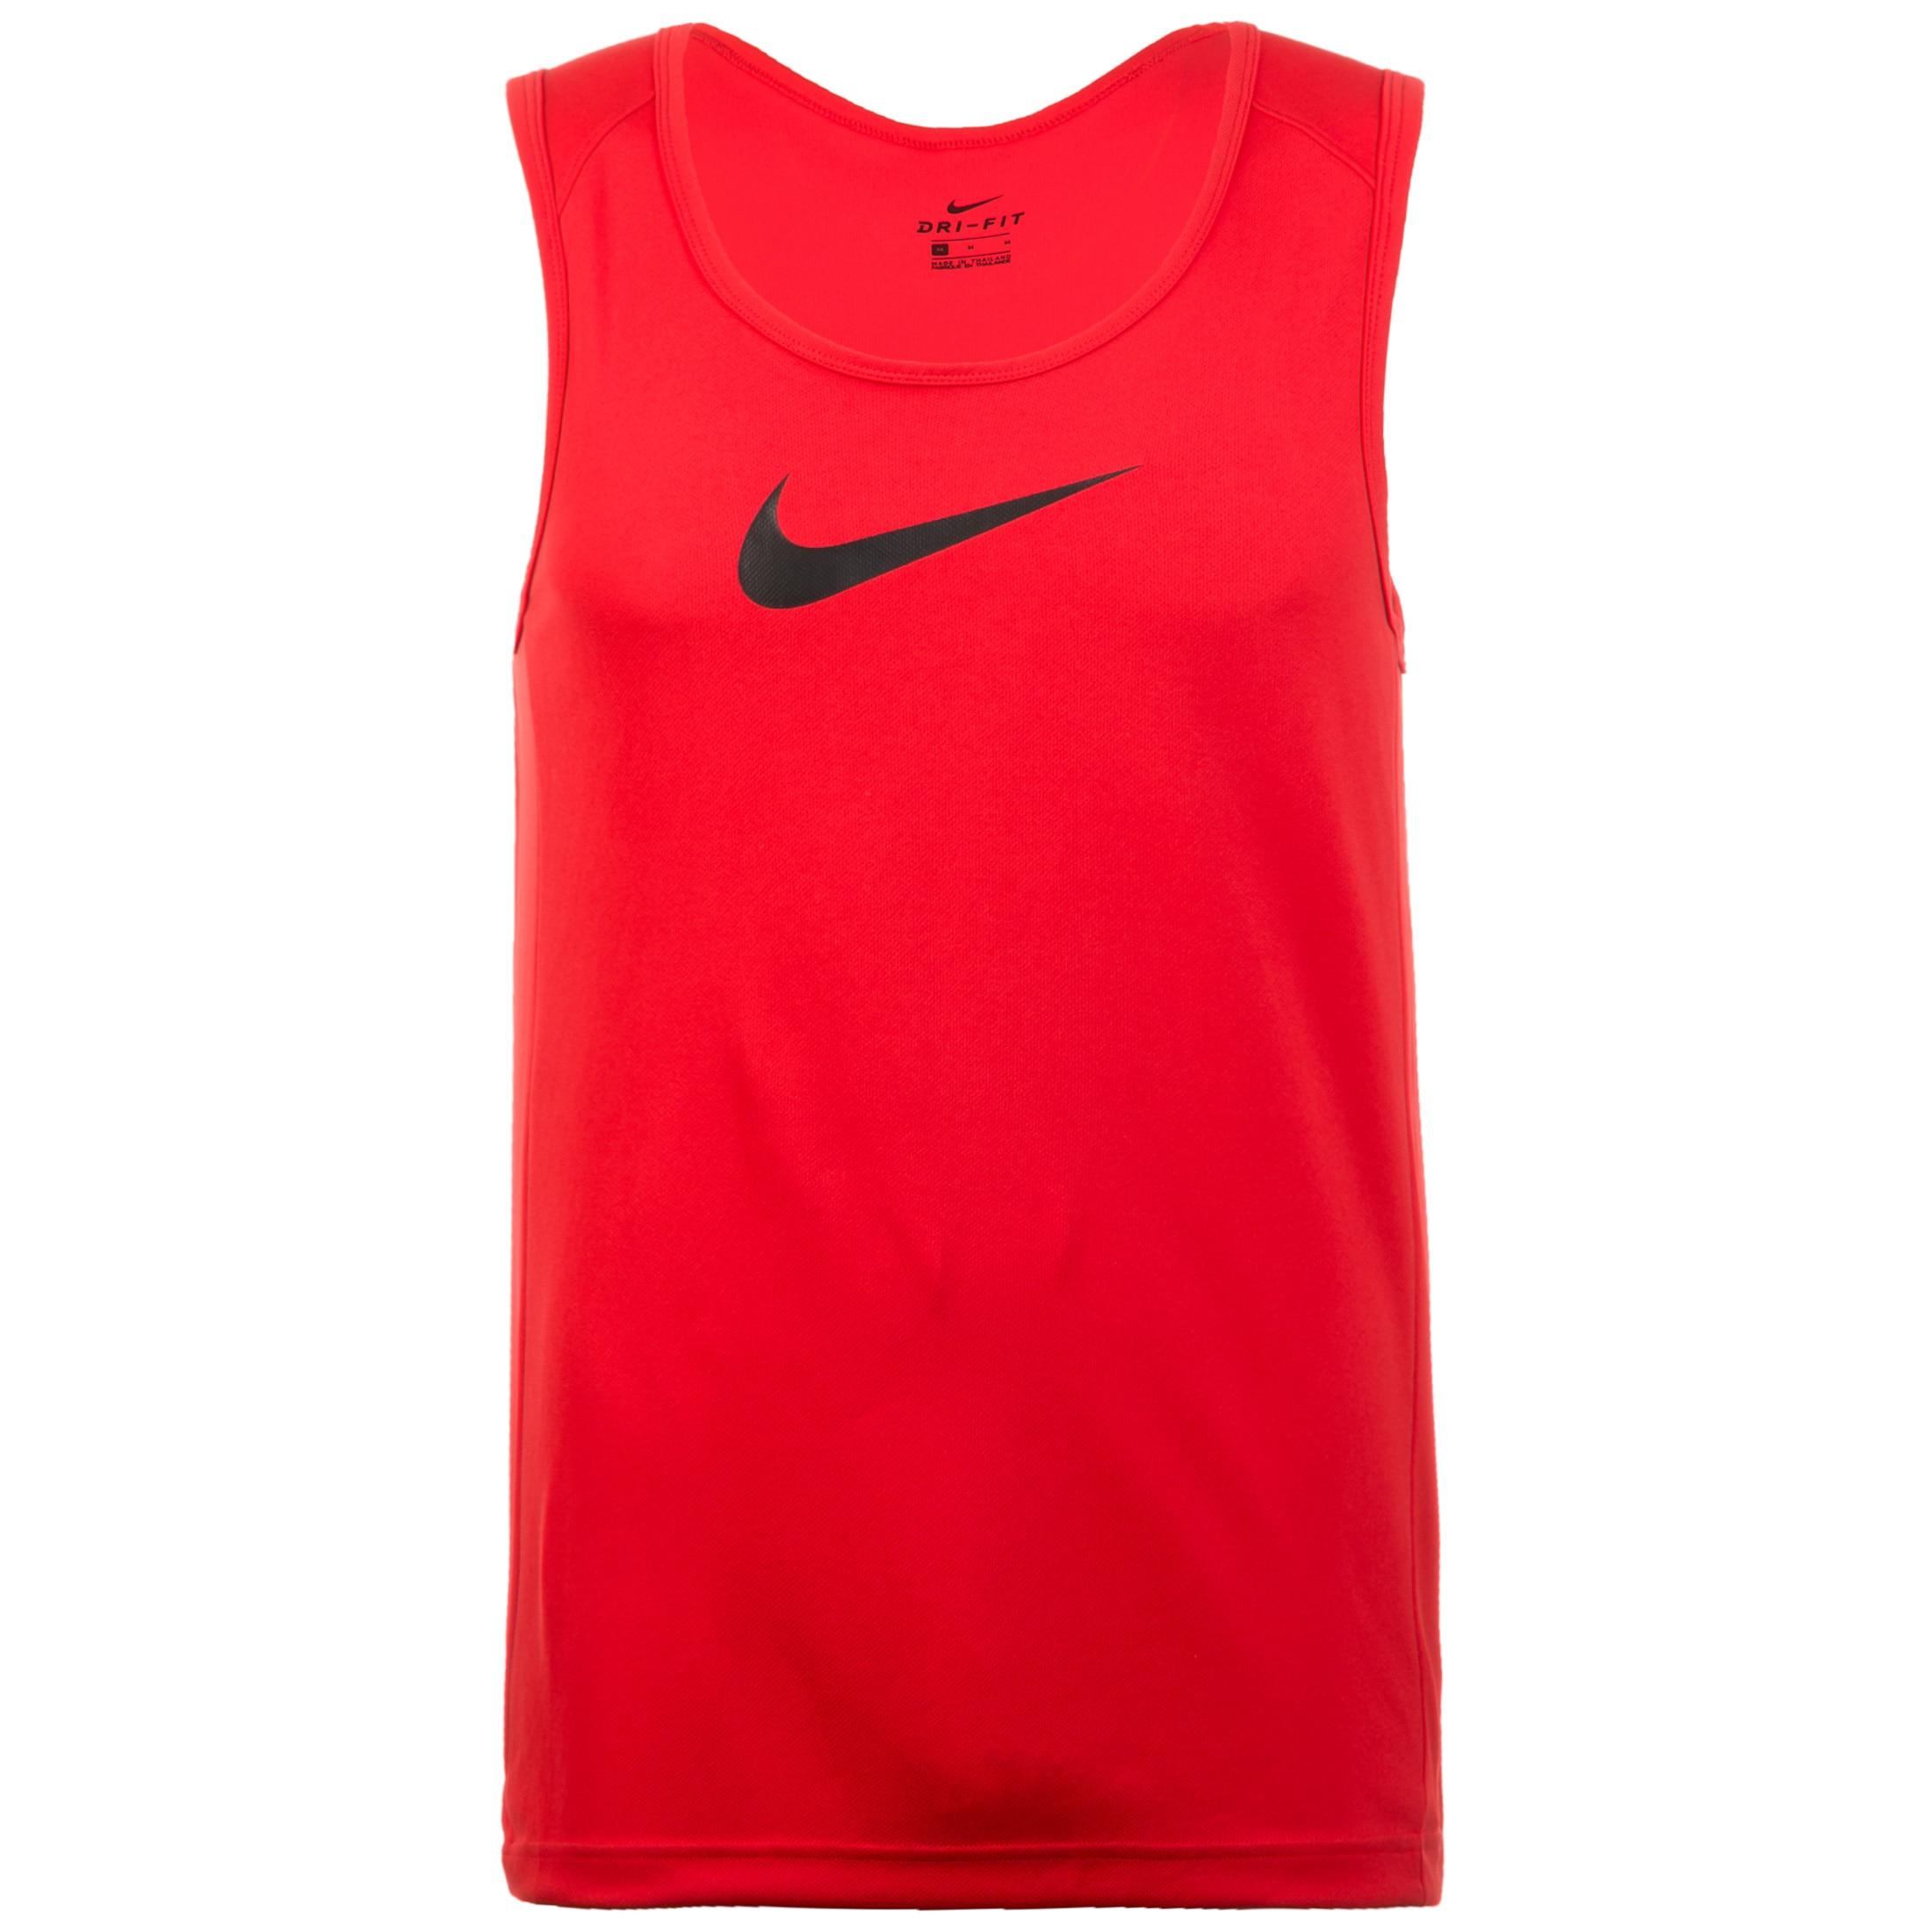 Nike Basketballtrikot Dry | Sportbekleidung > Trikots > Basketballtrikots | Nike